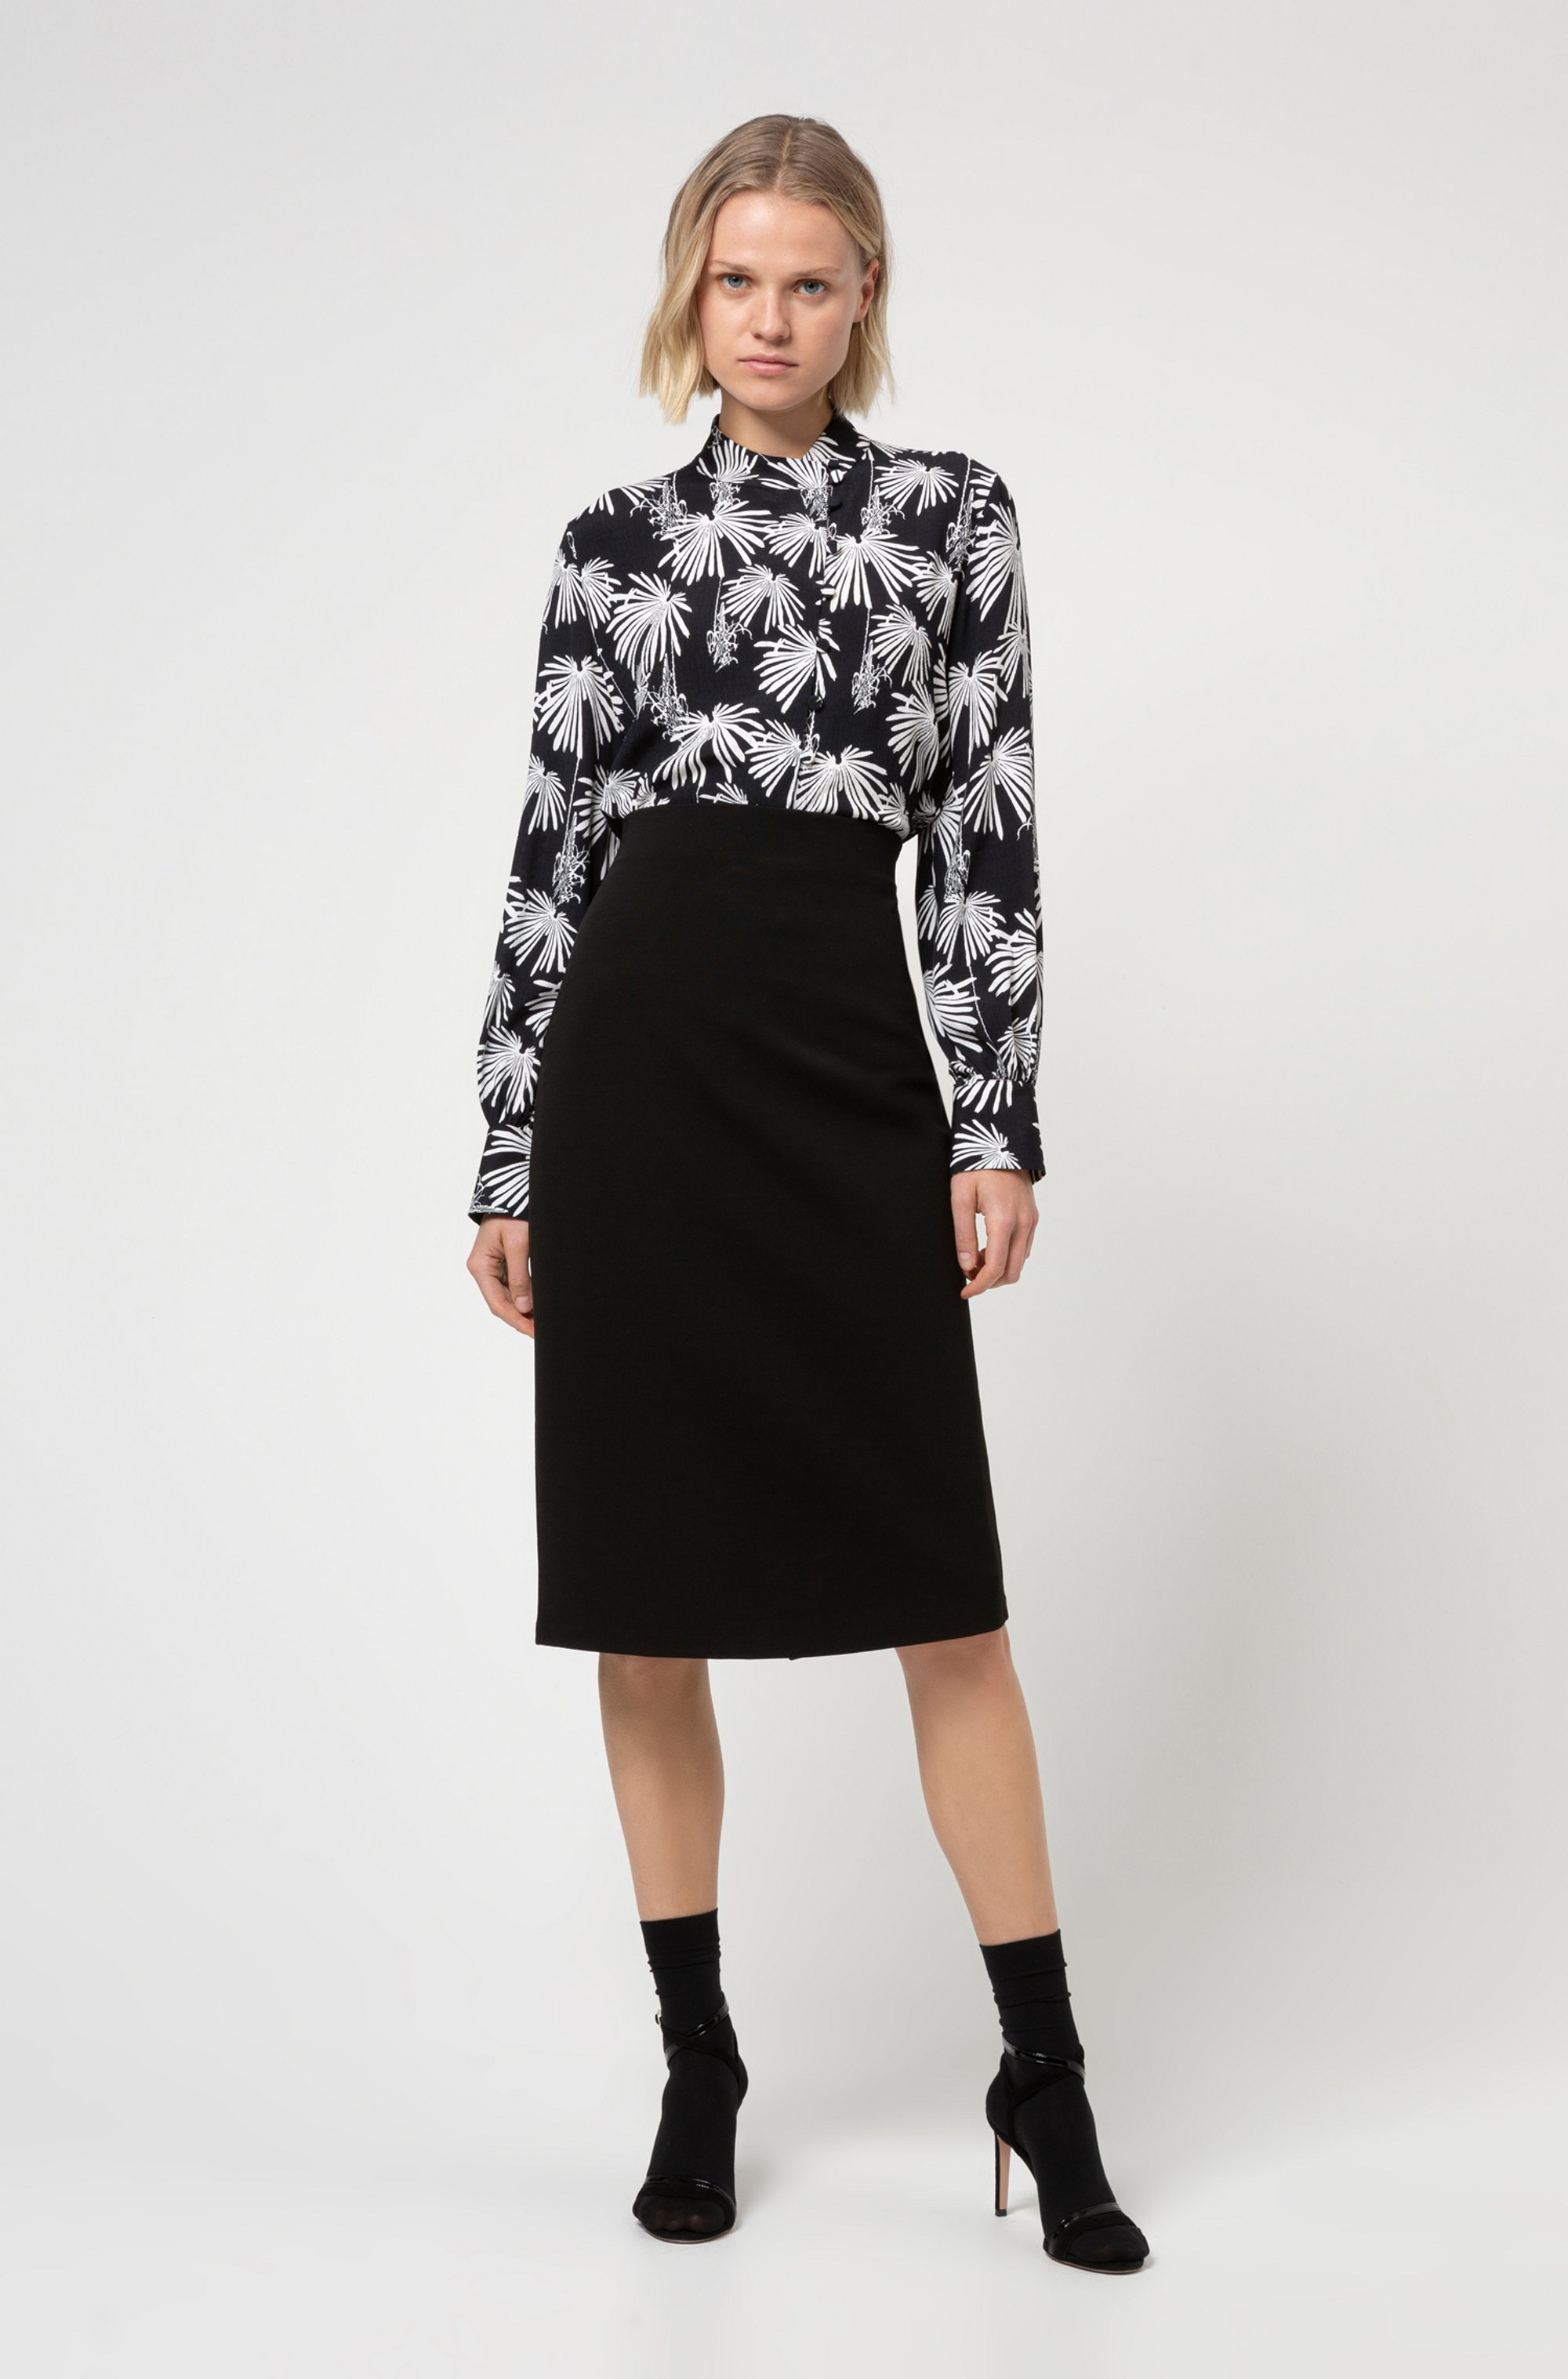 Midi-length tube skirt in stretch jersey